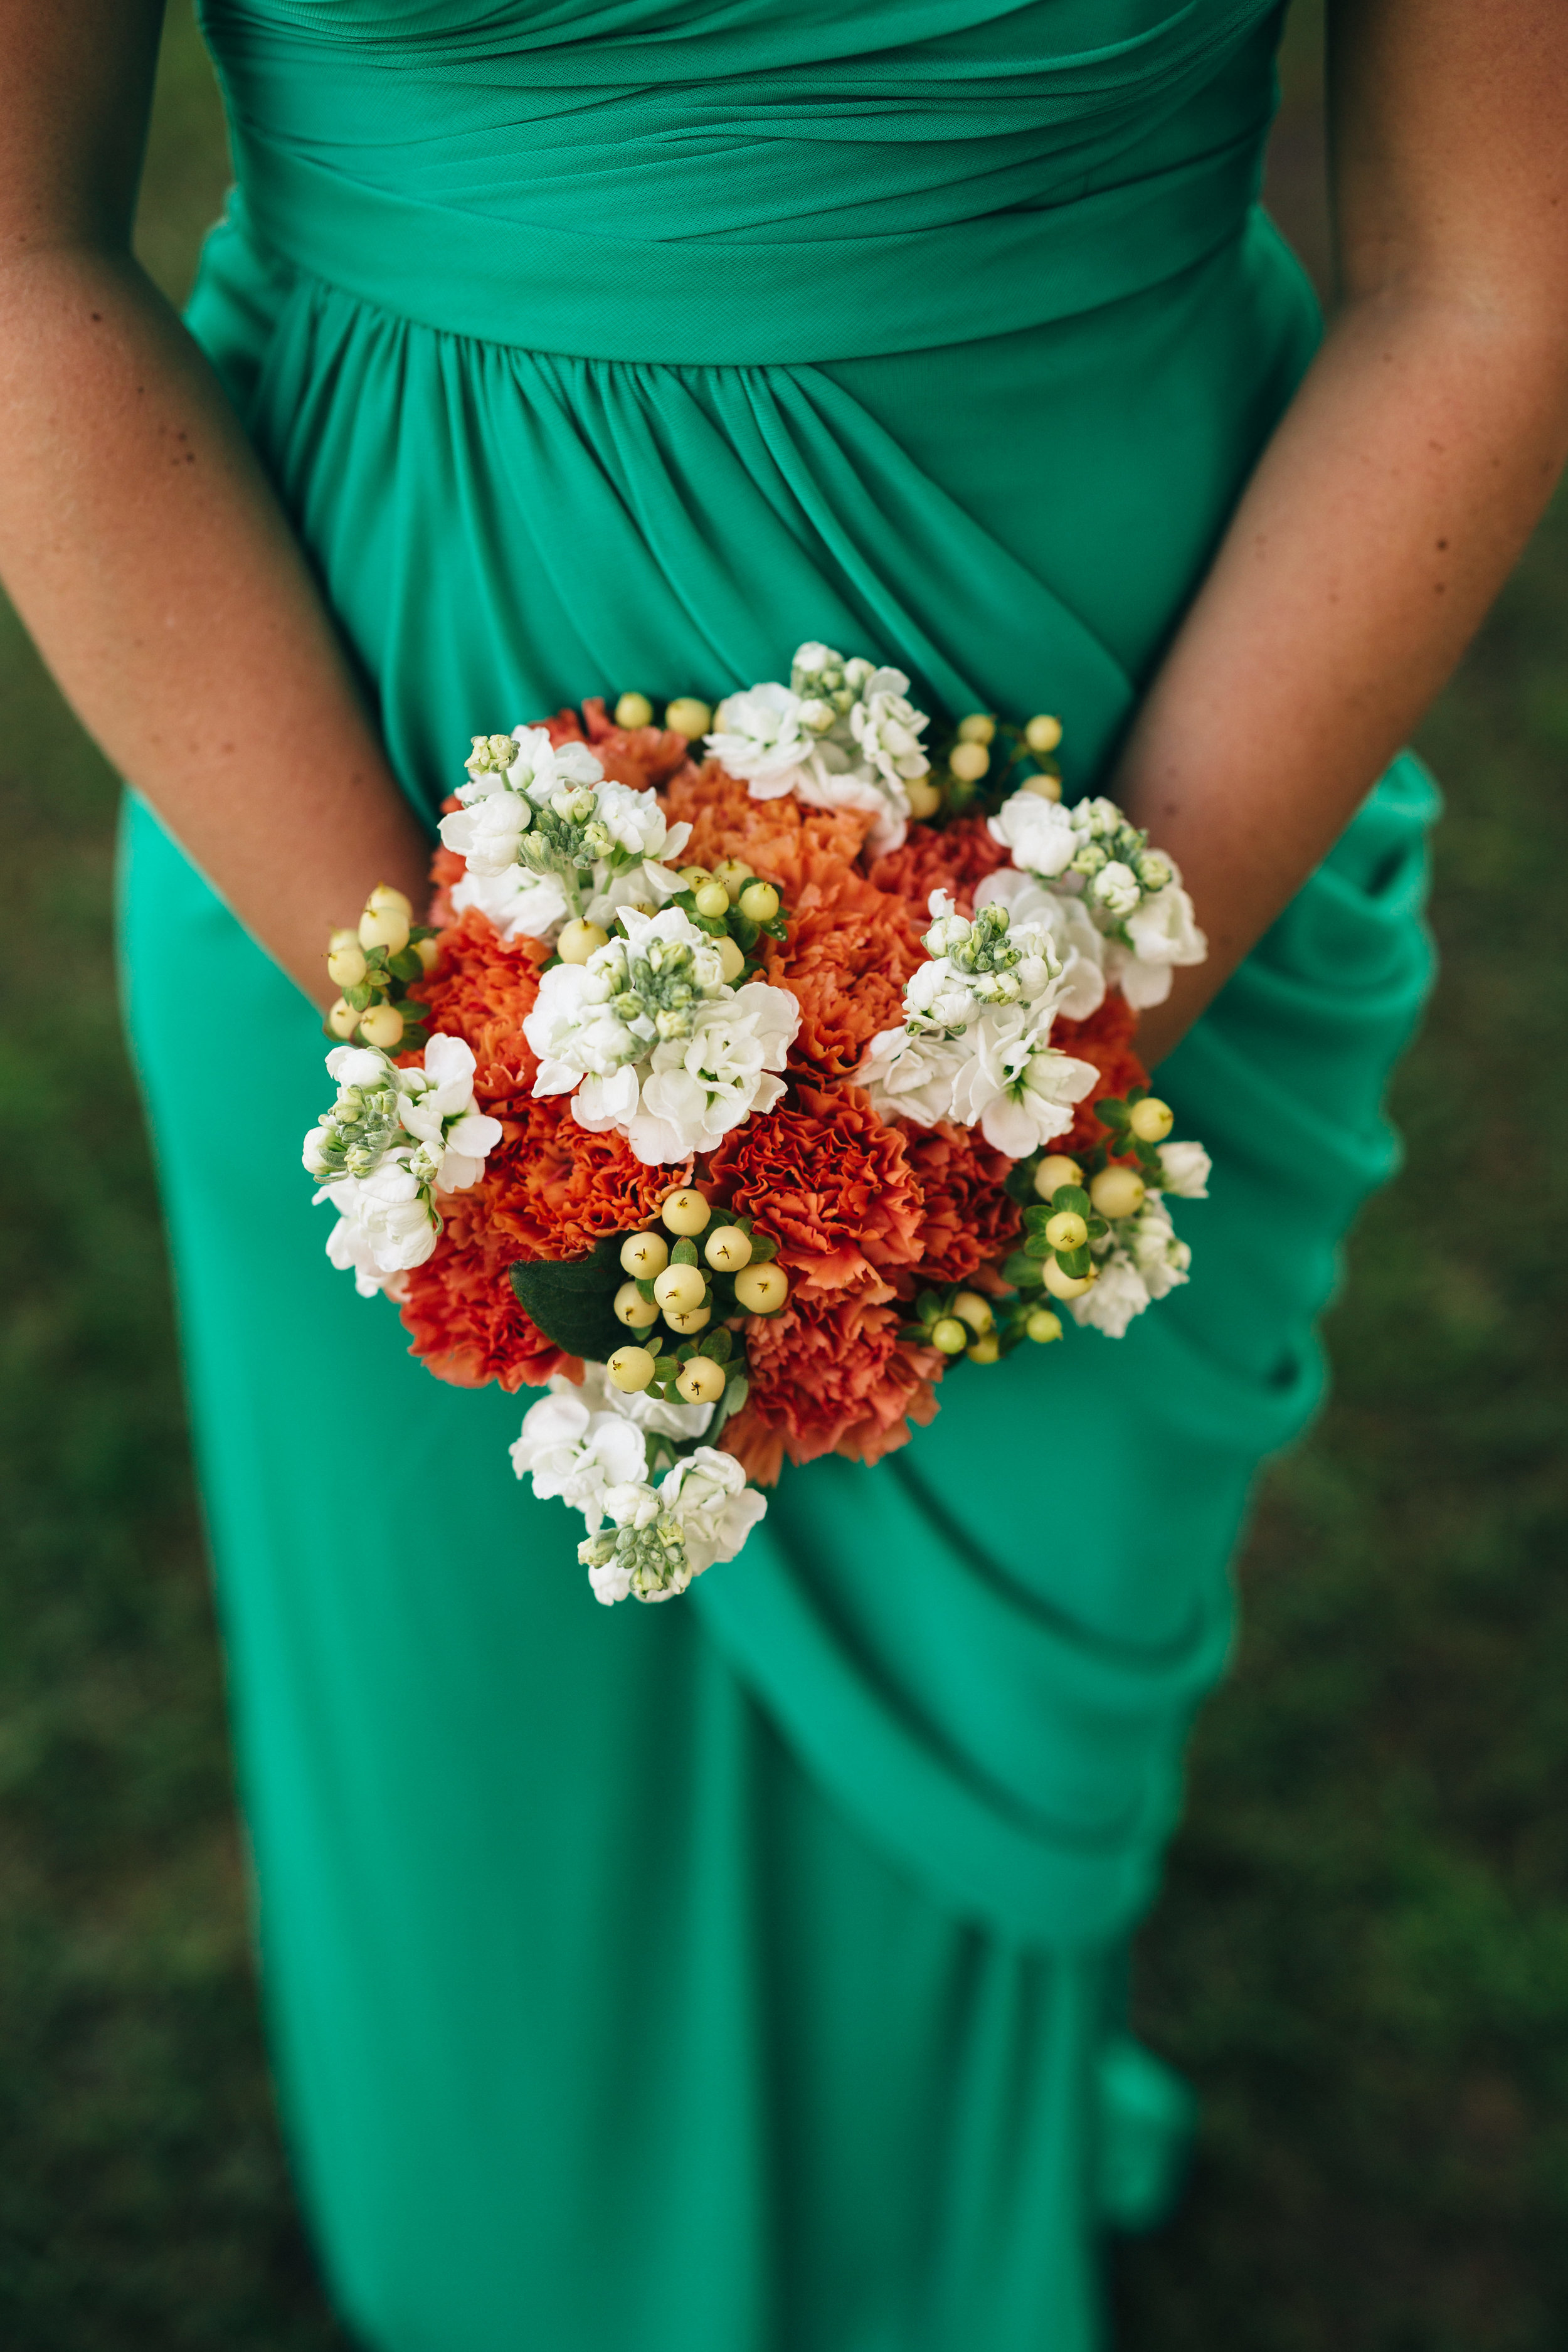 Bridesmaids dress and bouquet.